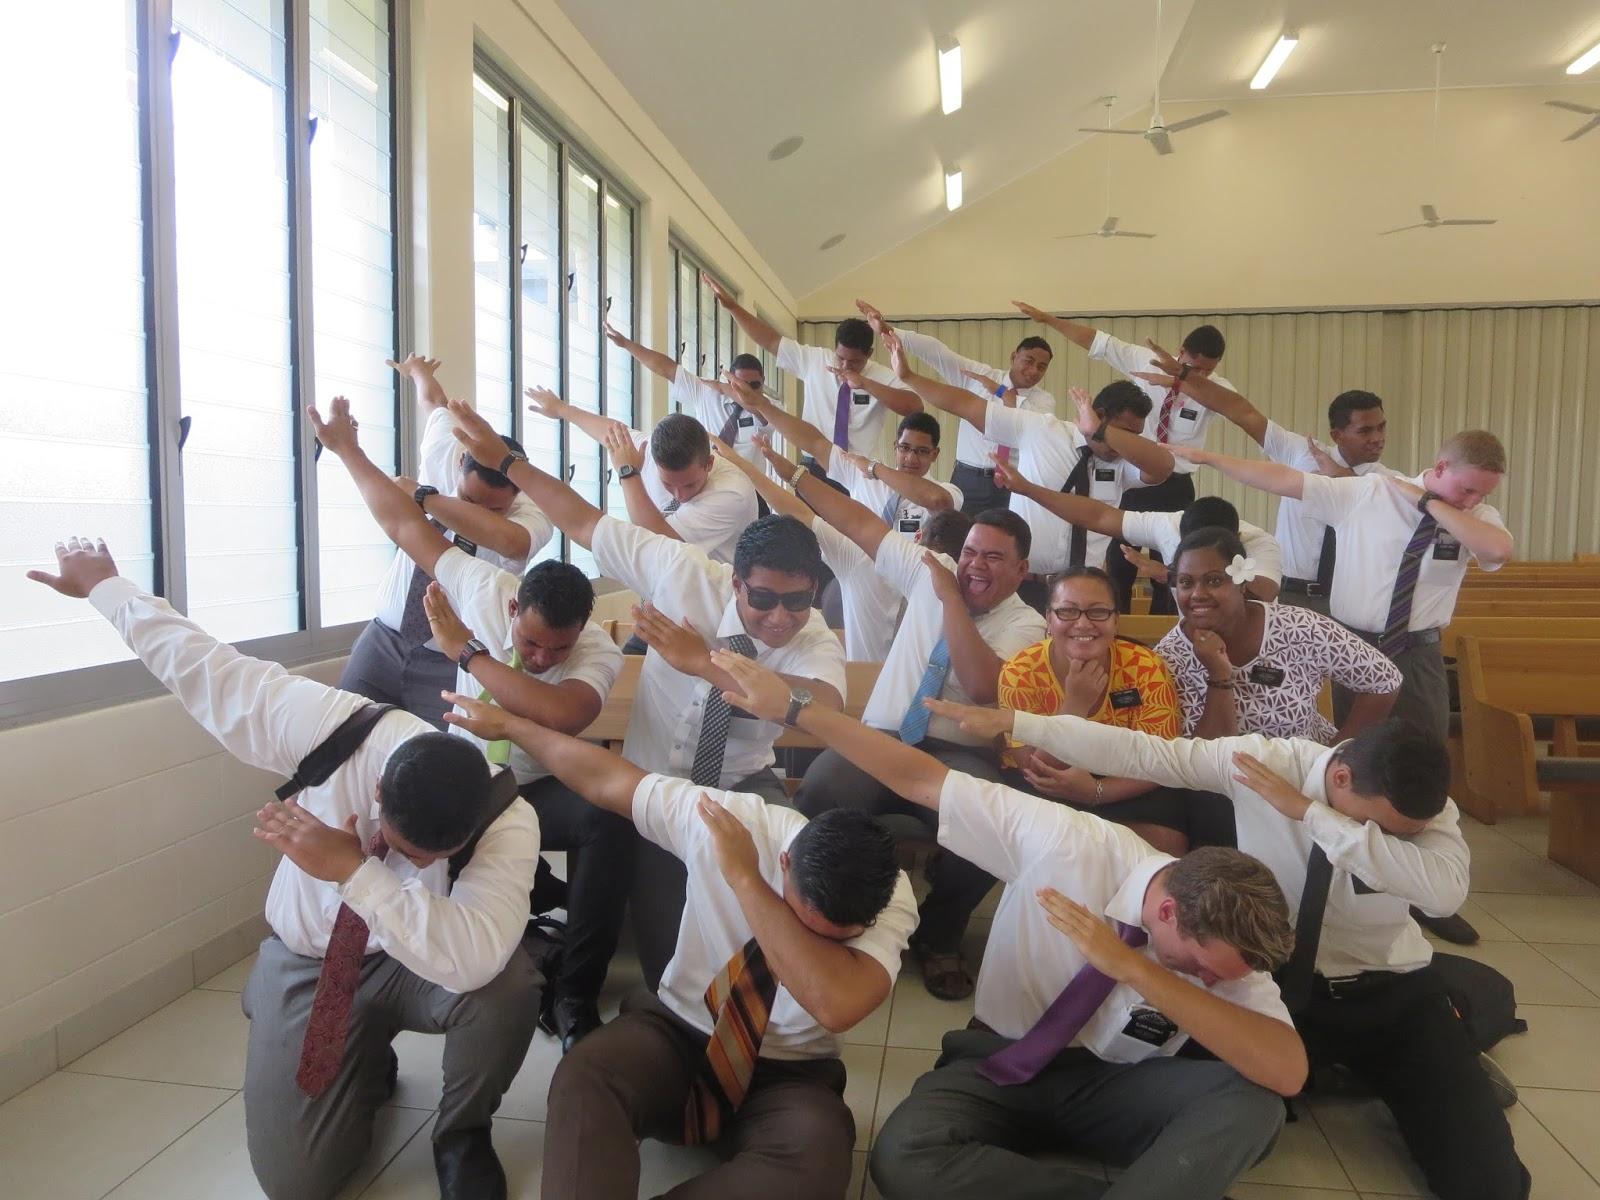 Justin Sterner Samoa Apia Mission: June 26 - Doing the dab